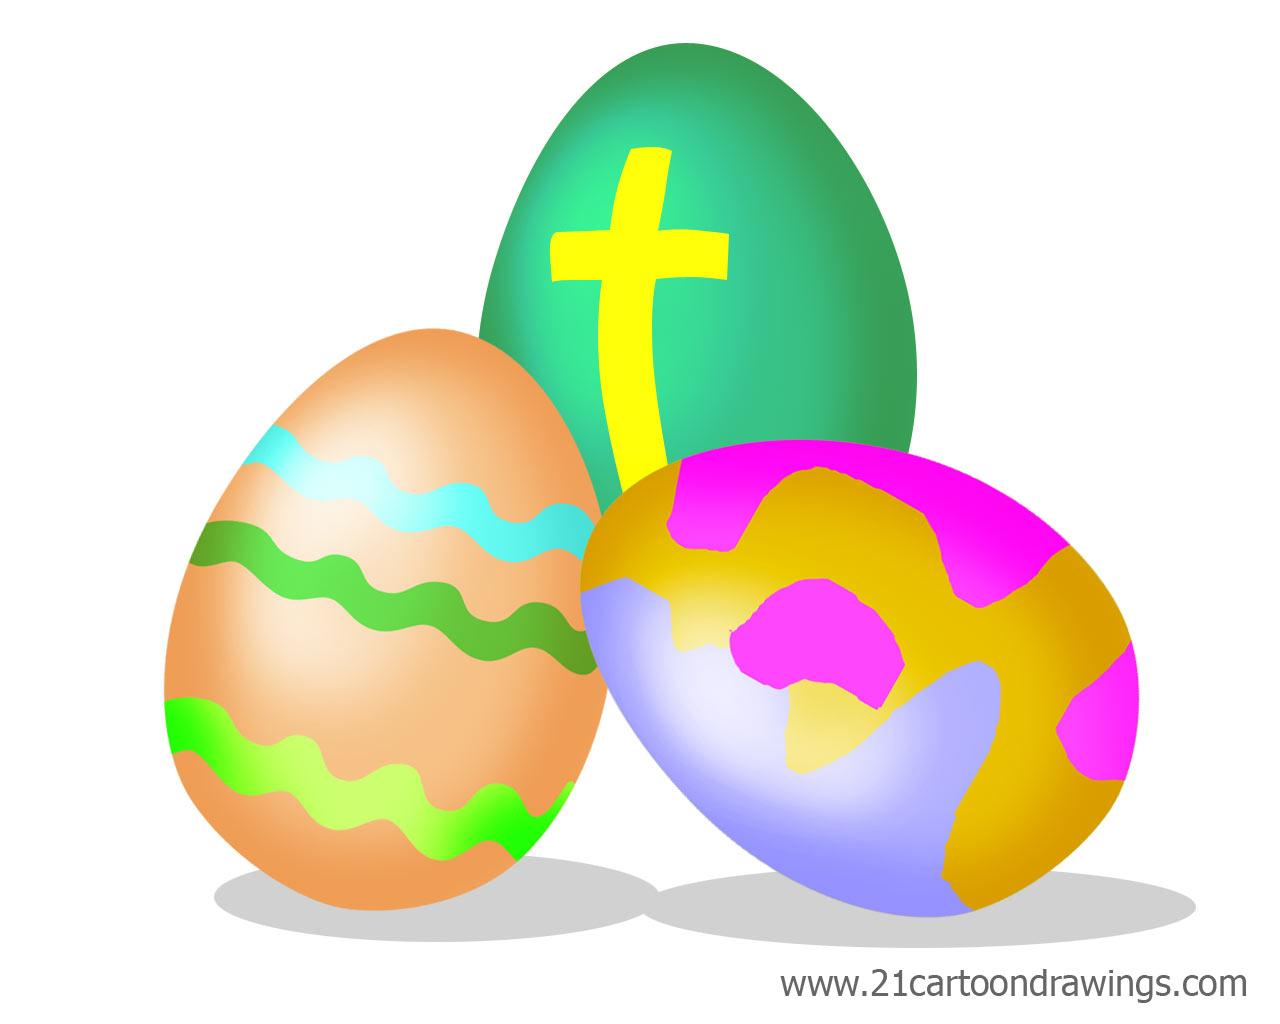 April clipart religious, April religious Transparent FREE for.